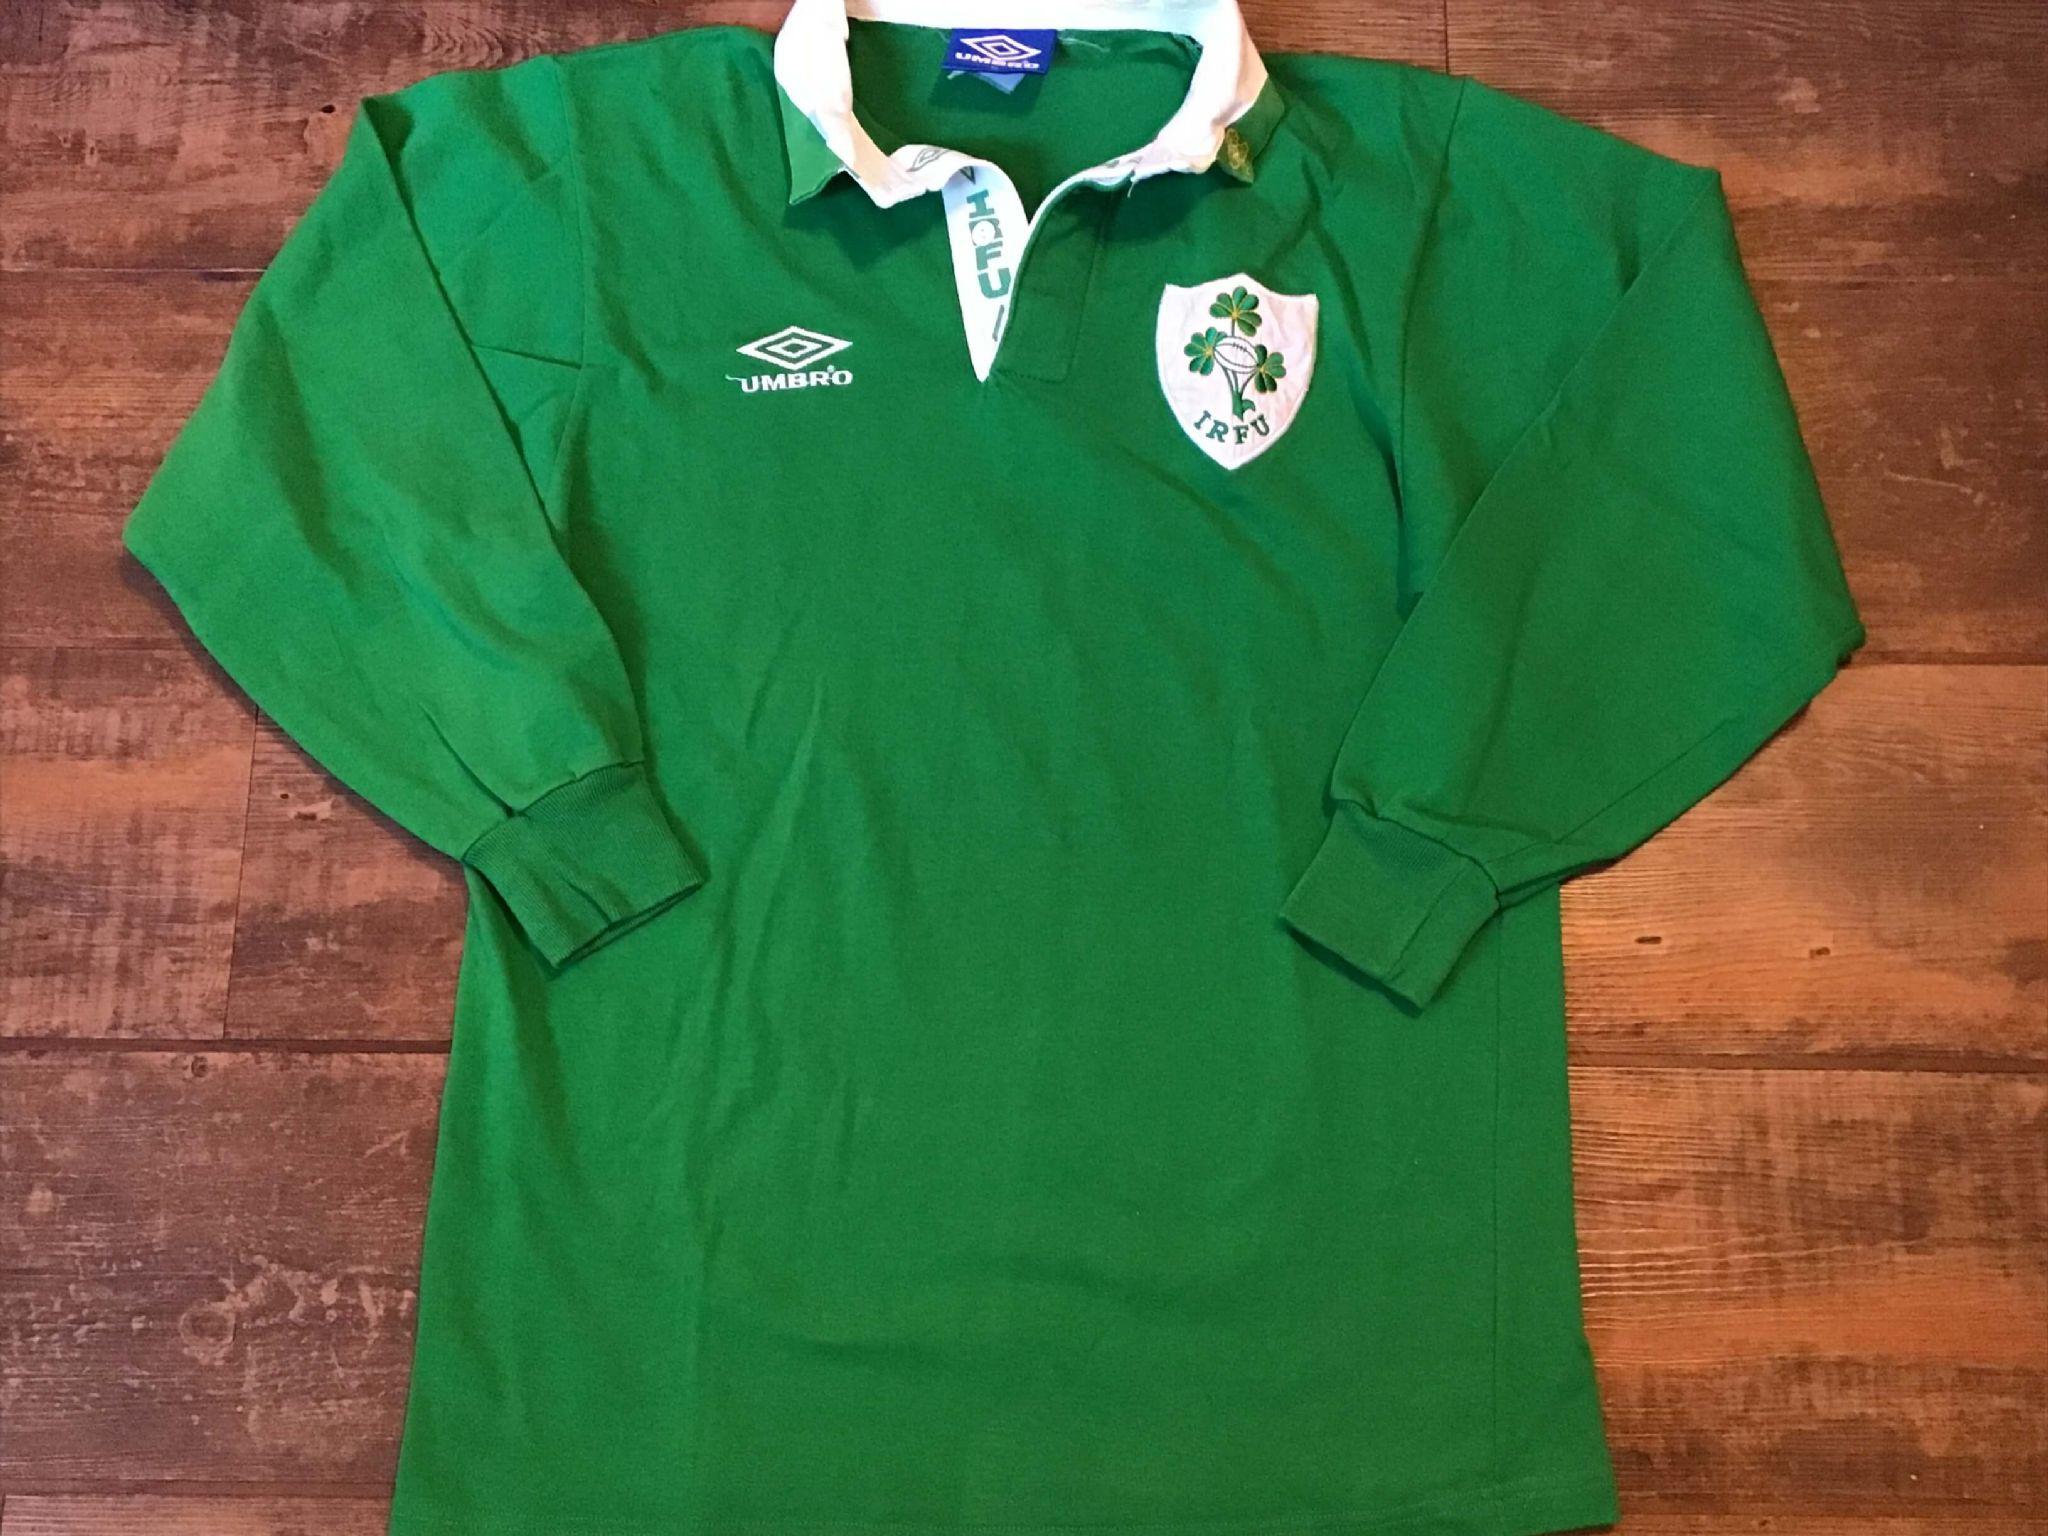 Camiseta de local de Umbro de Irlanda 1992-93